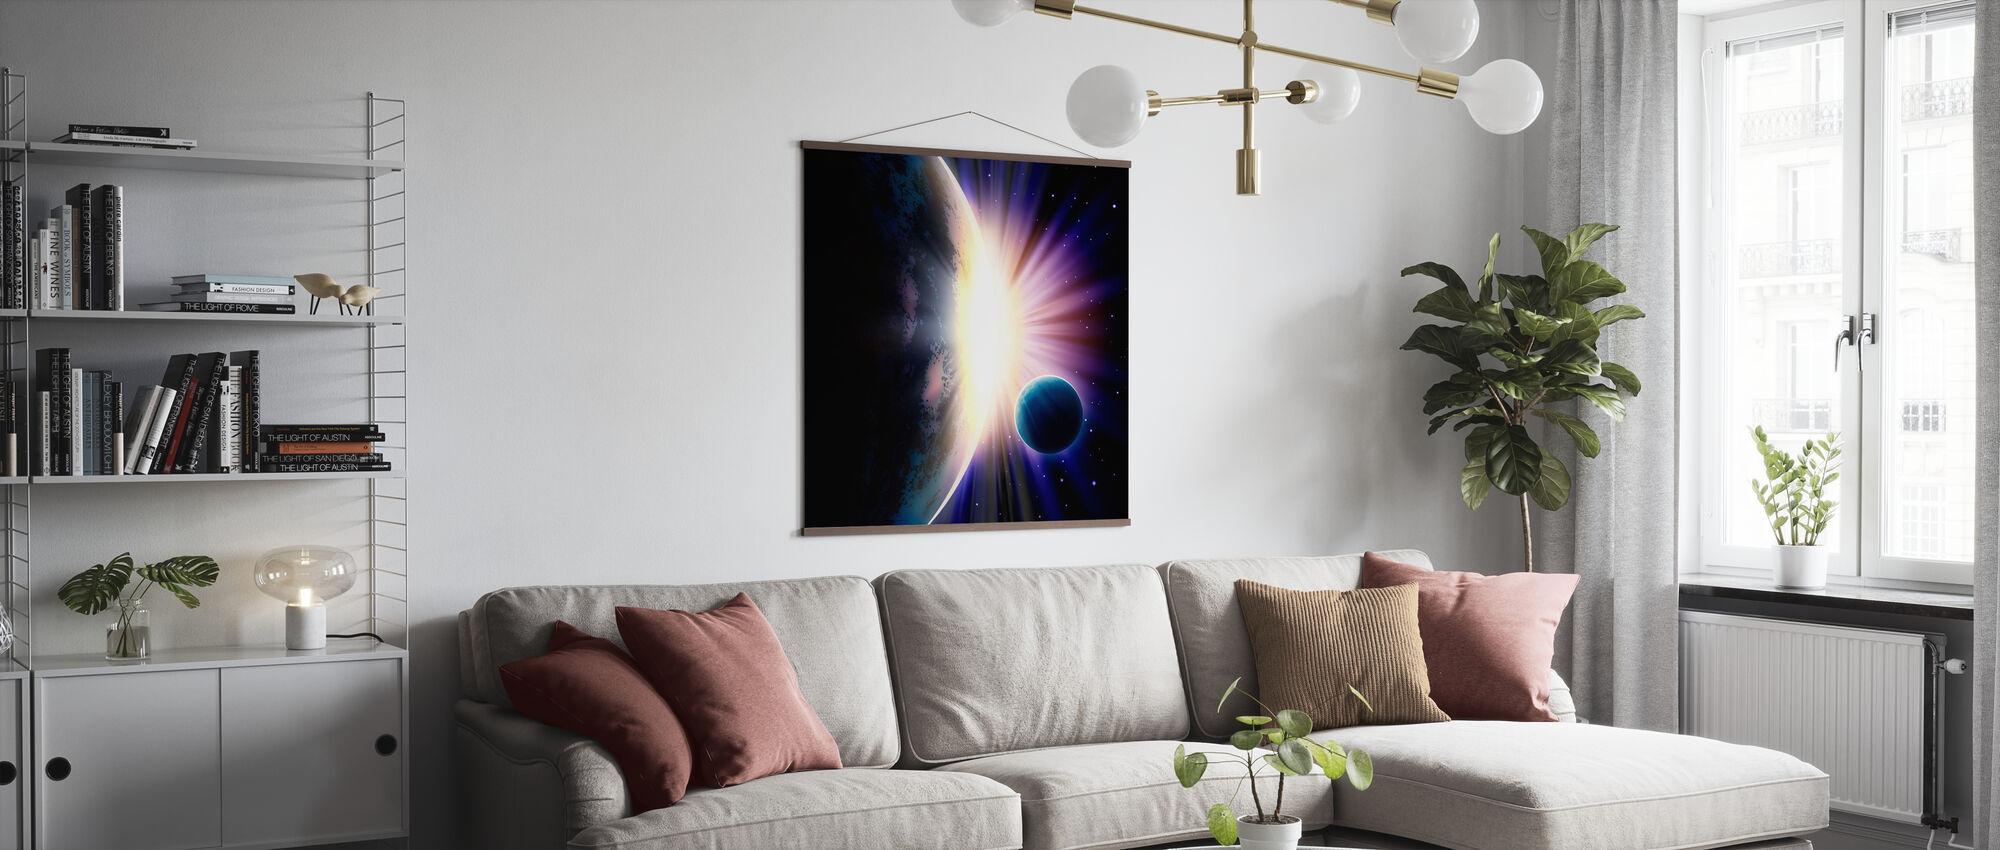 Rymd soluppgång - Poster - Vardagsrum